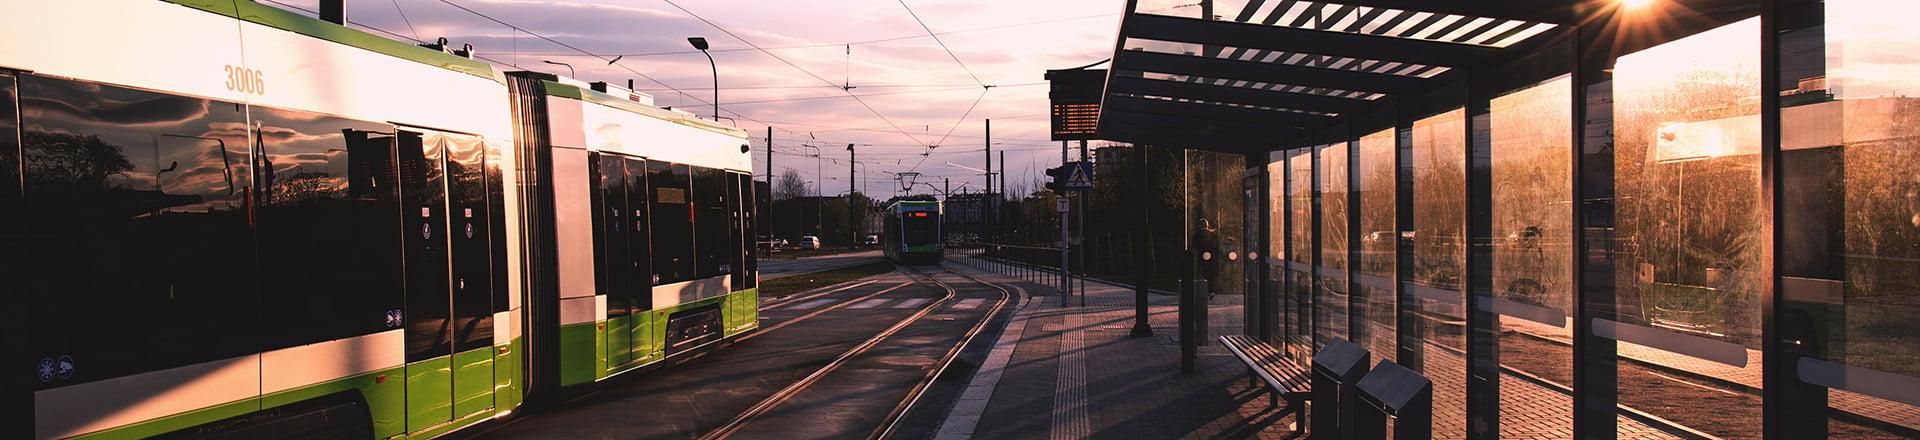 Blog_transportation_1920x440